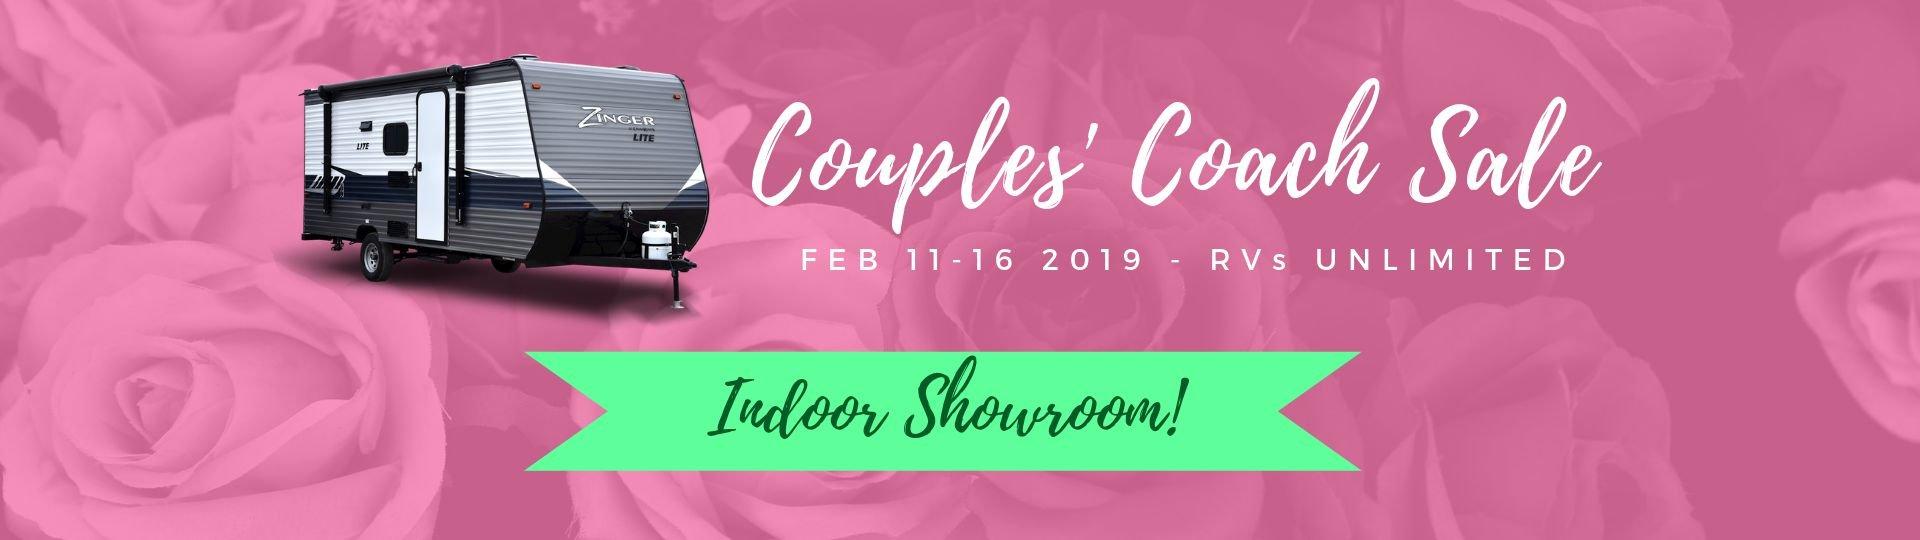 Couple's Coach Sale - Feb 11 to 16 - Slide Image